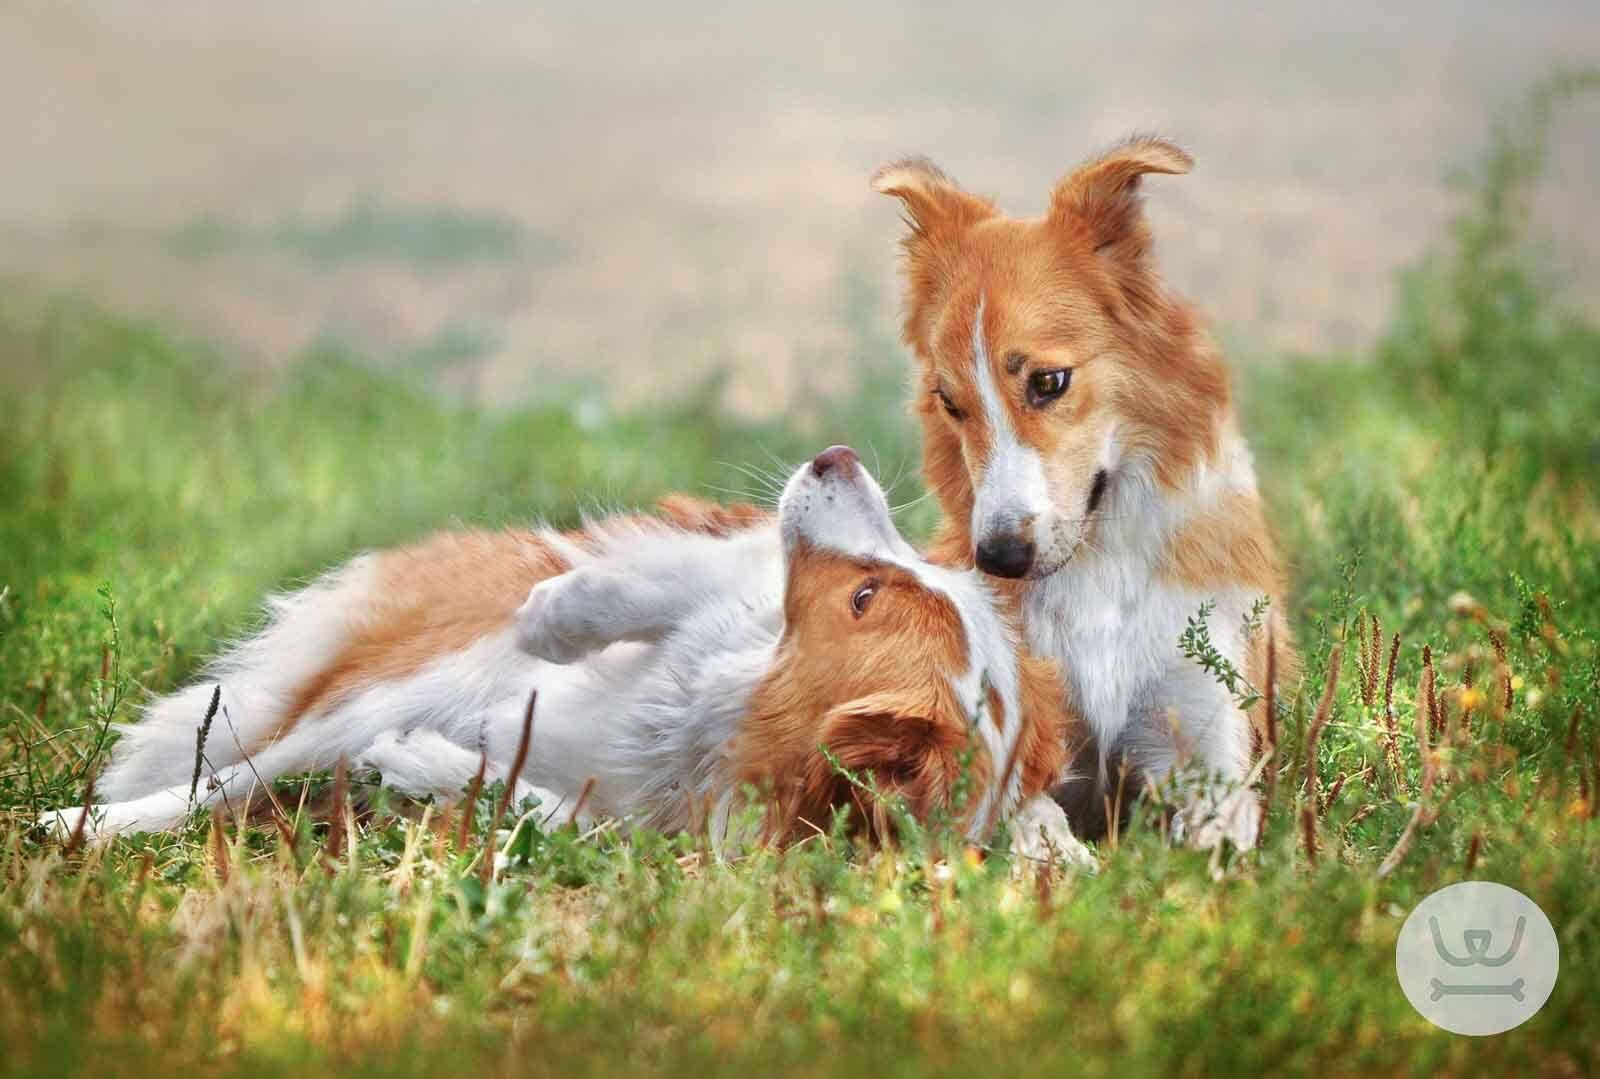 8dbb3635b6fe Woofland - Τι συμβαίνει με τα σκυλιά στην Ελλάδα 1ο - Άνθρωπος και σκύλος